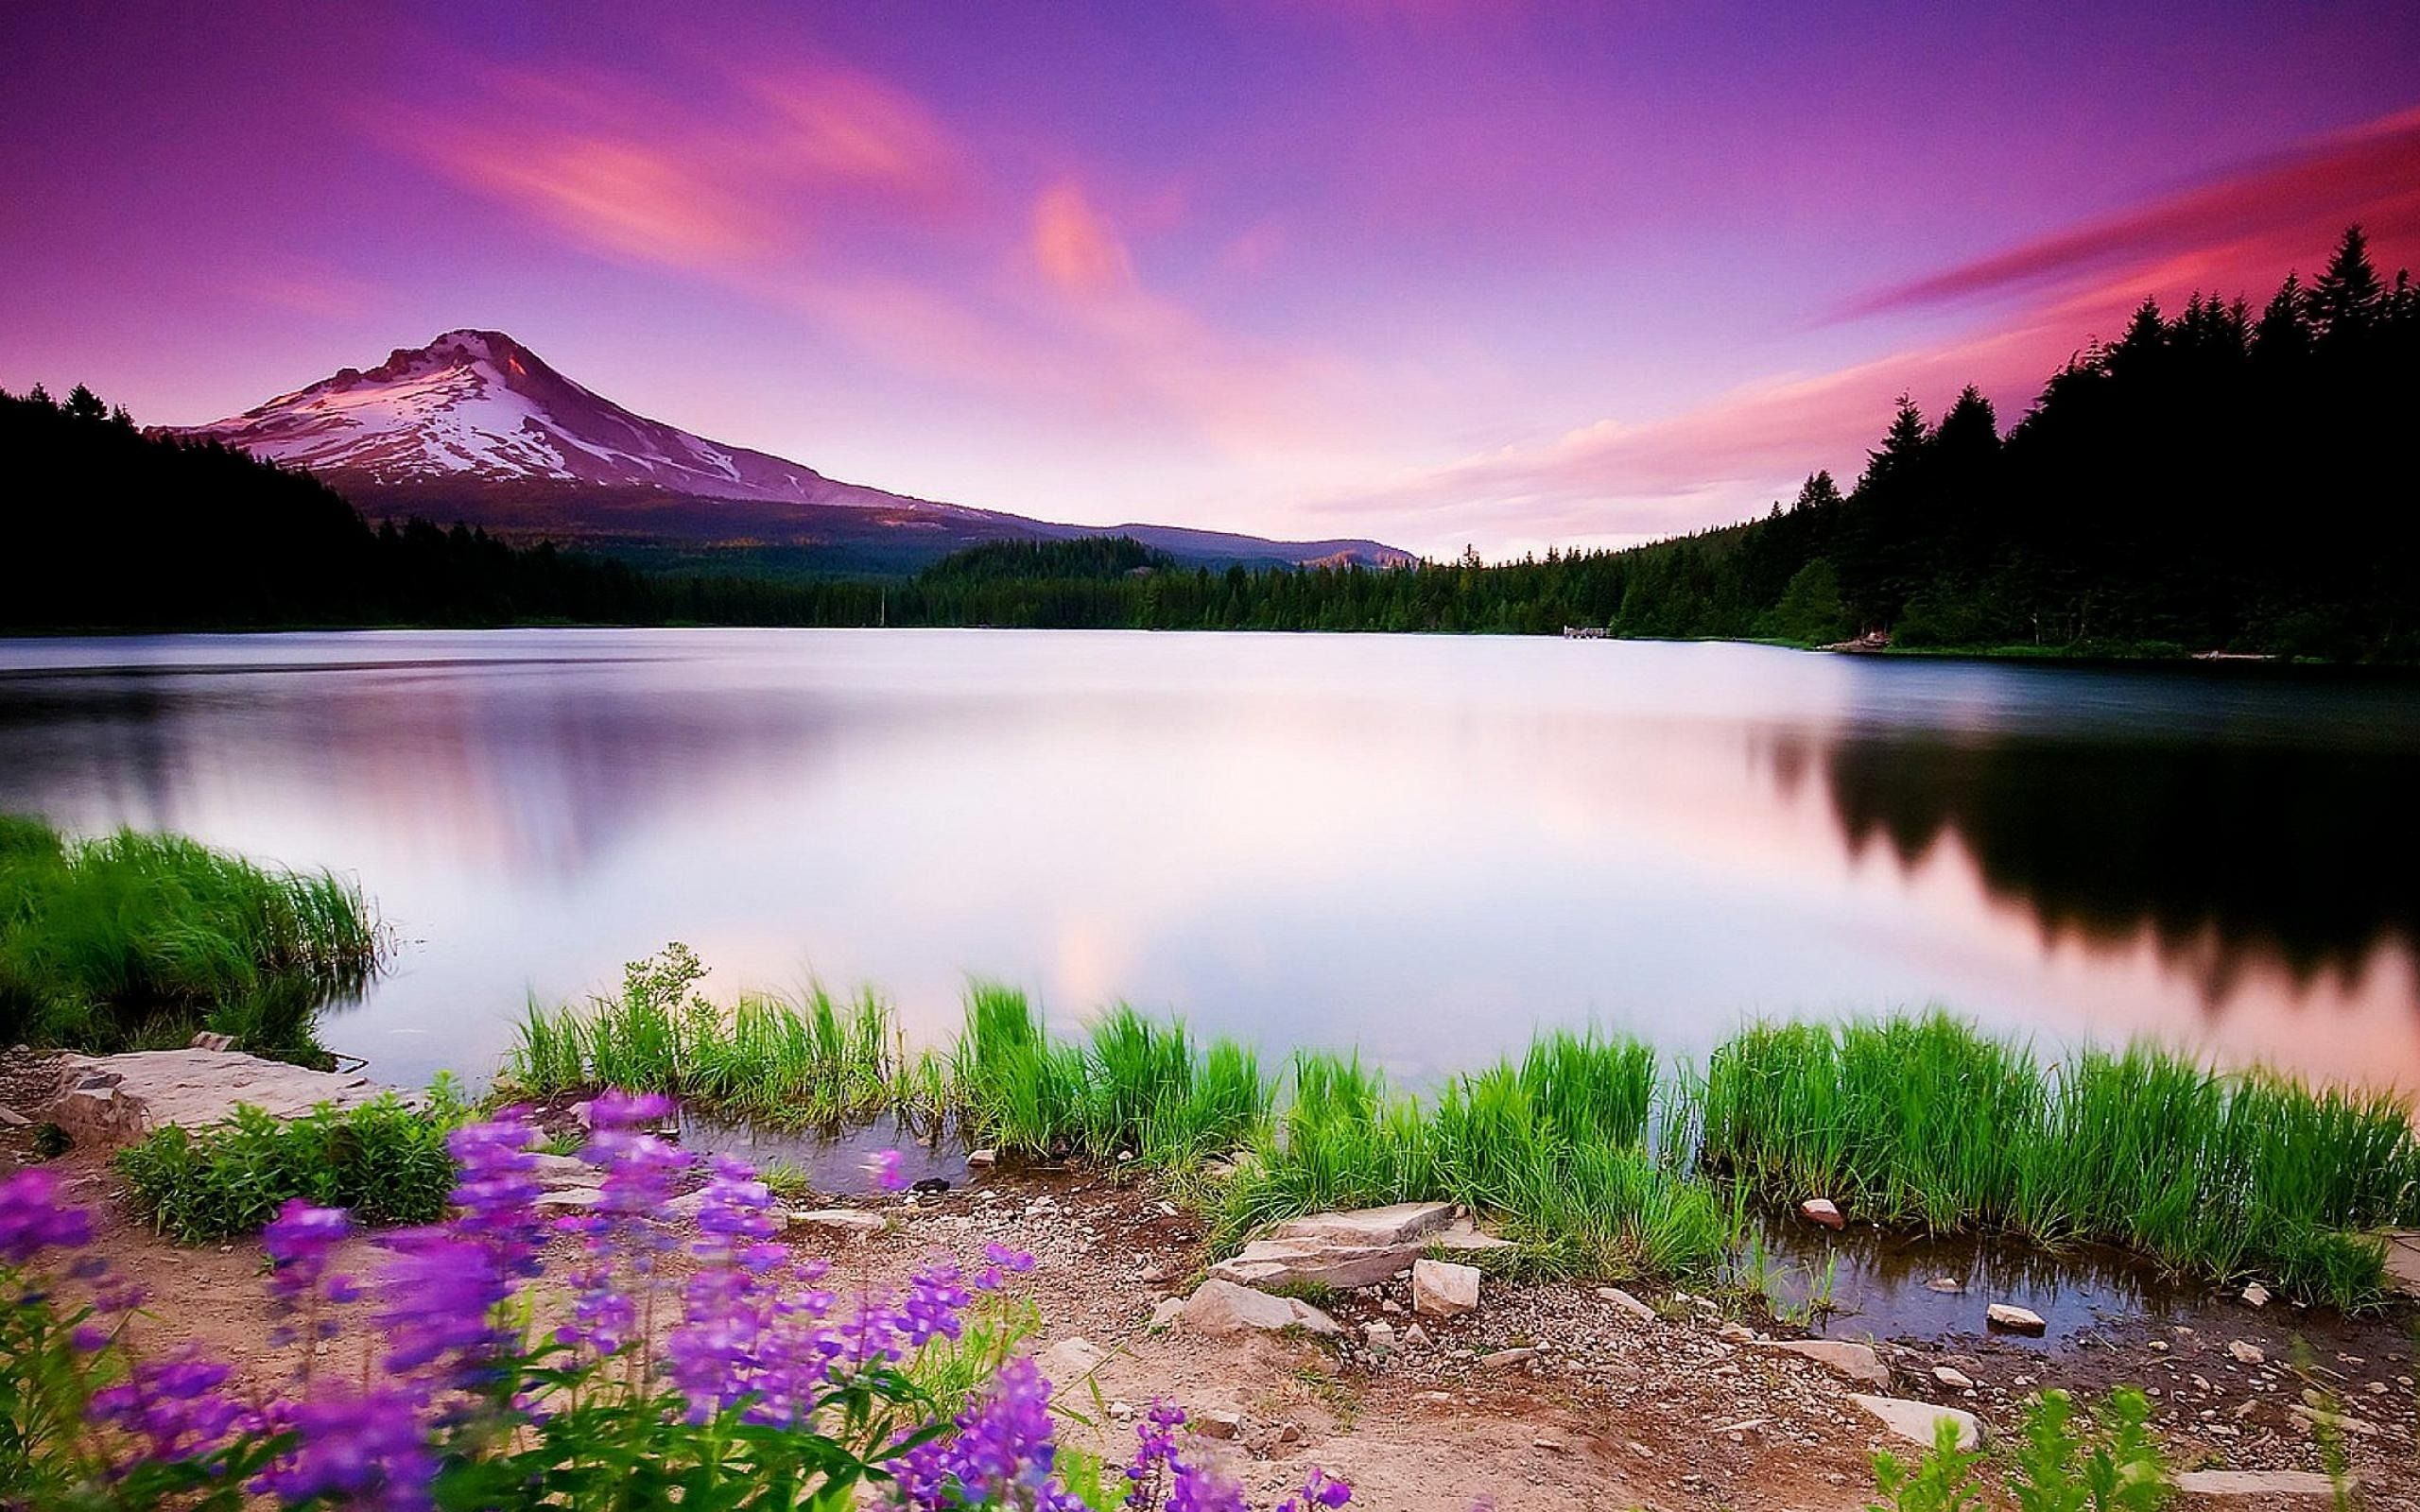 Scenic Purple Coloured Mountain Lake Landscape Desktop Wallpaper Background Beautiful Landscapes Beautiful Nature Nature Photography